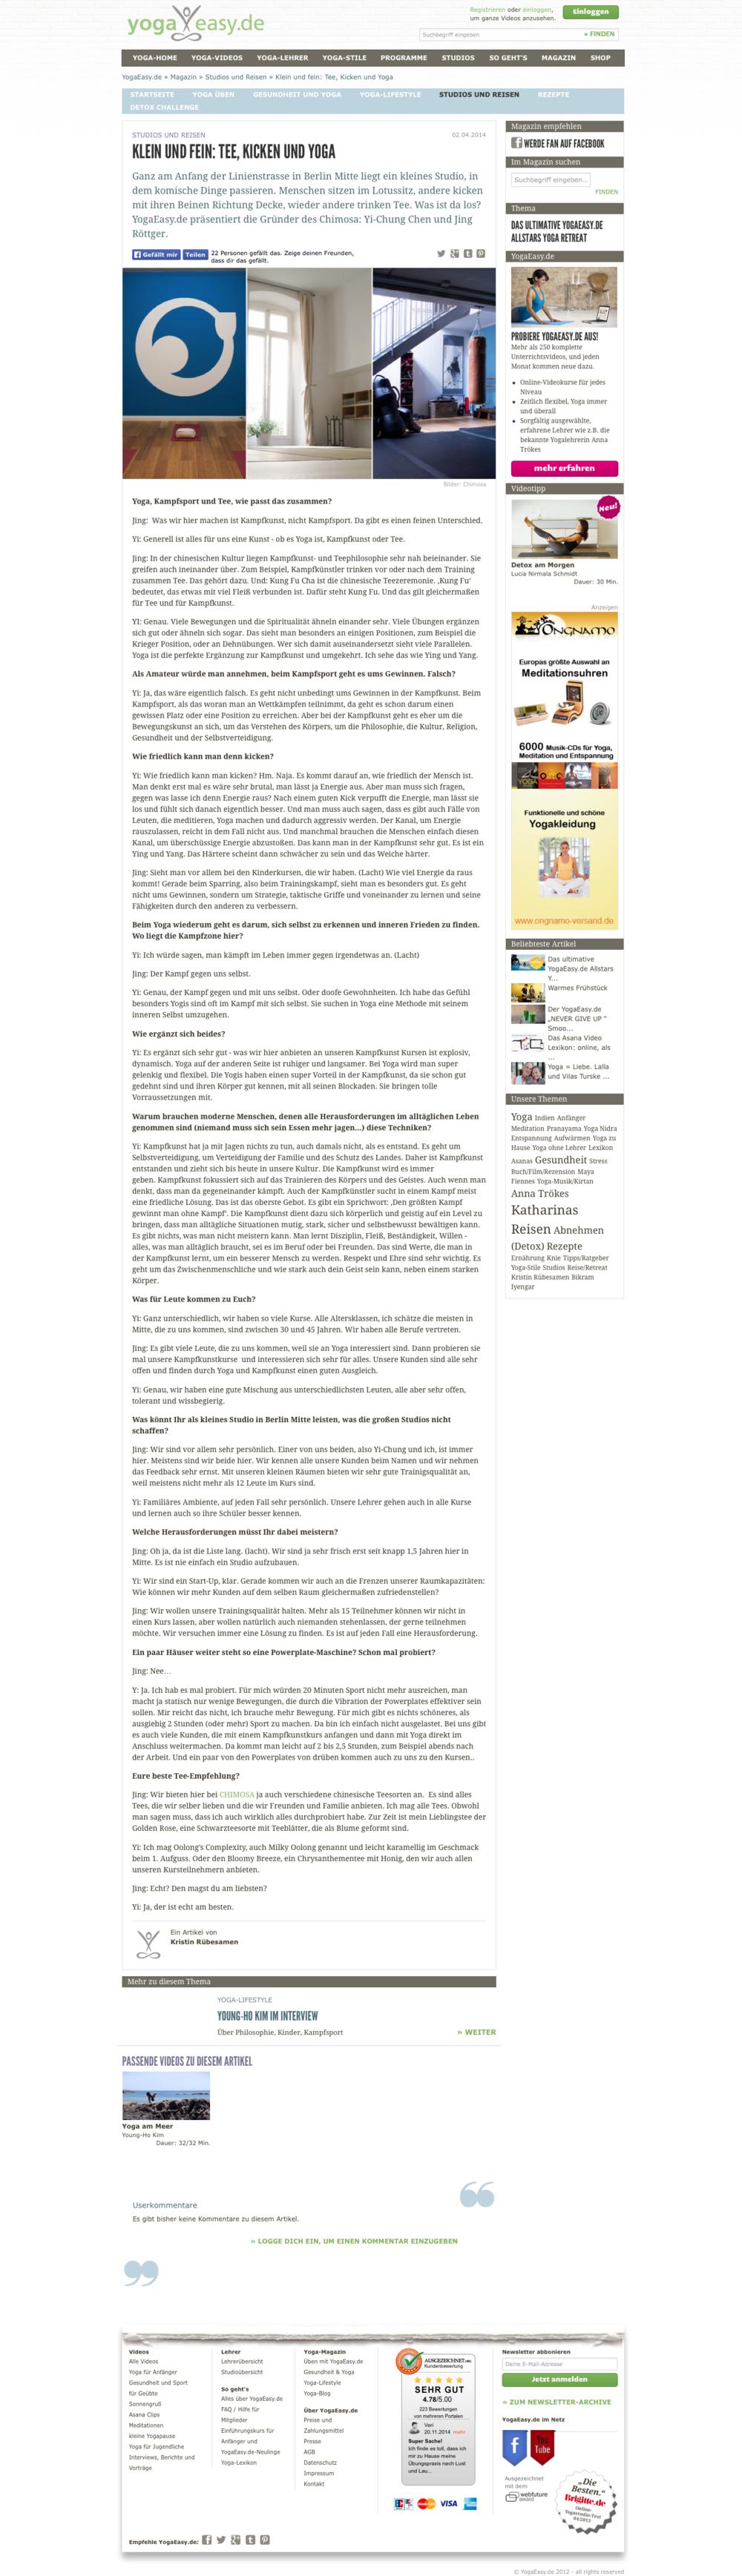 CHIMOSA_yogaeasy.de_Online_Clipping_02042014.jpeg